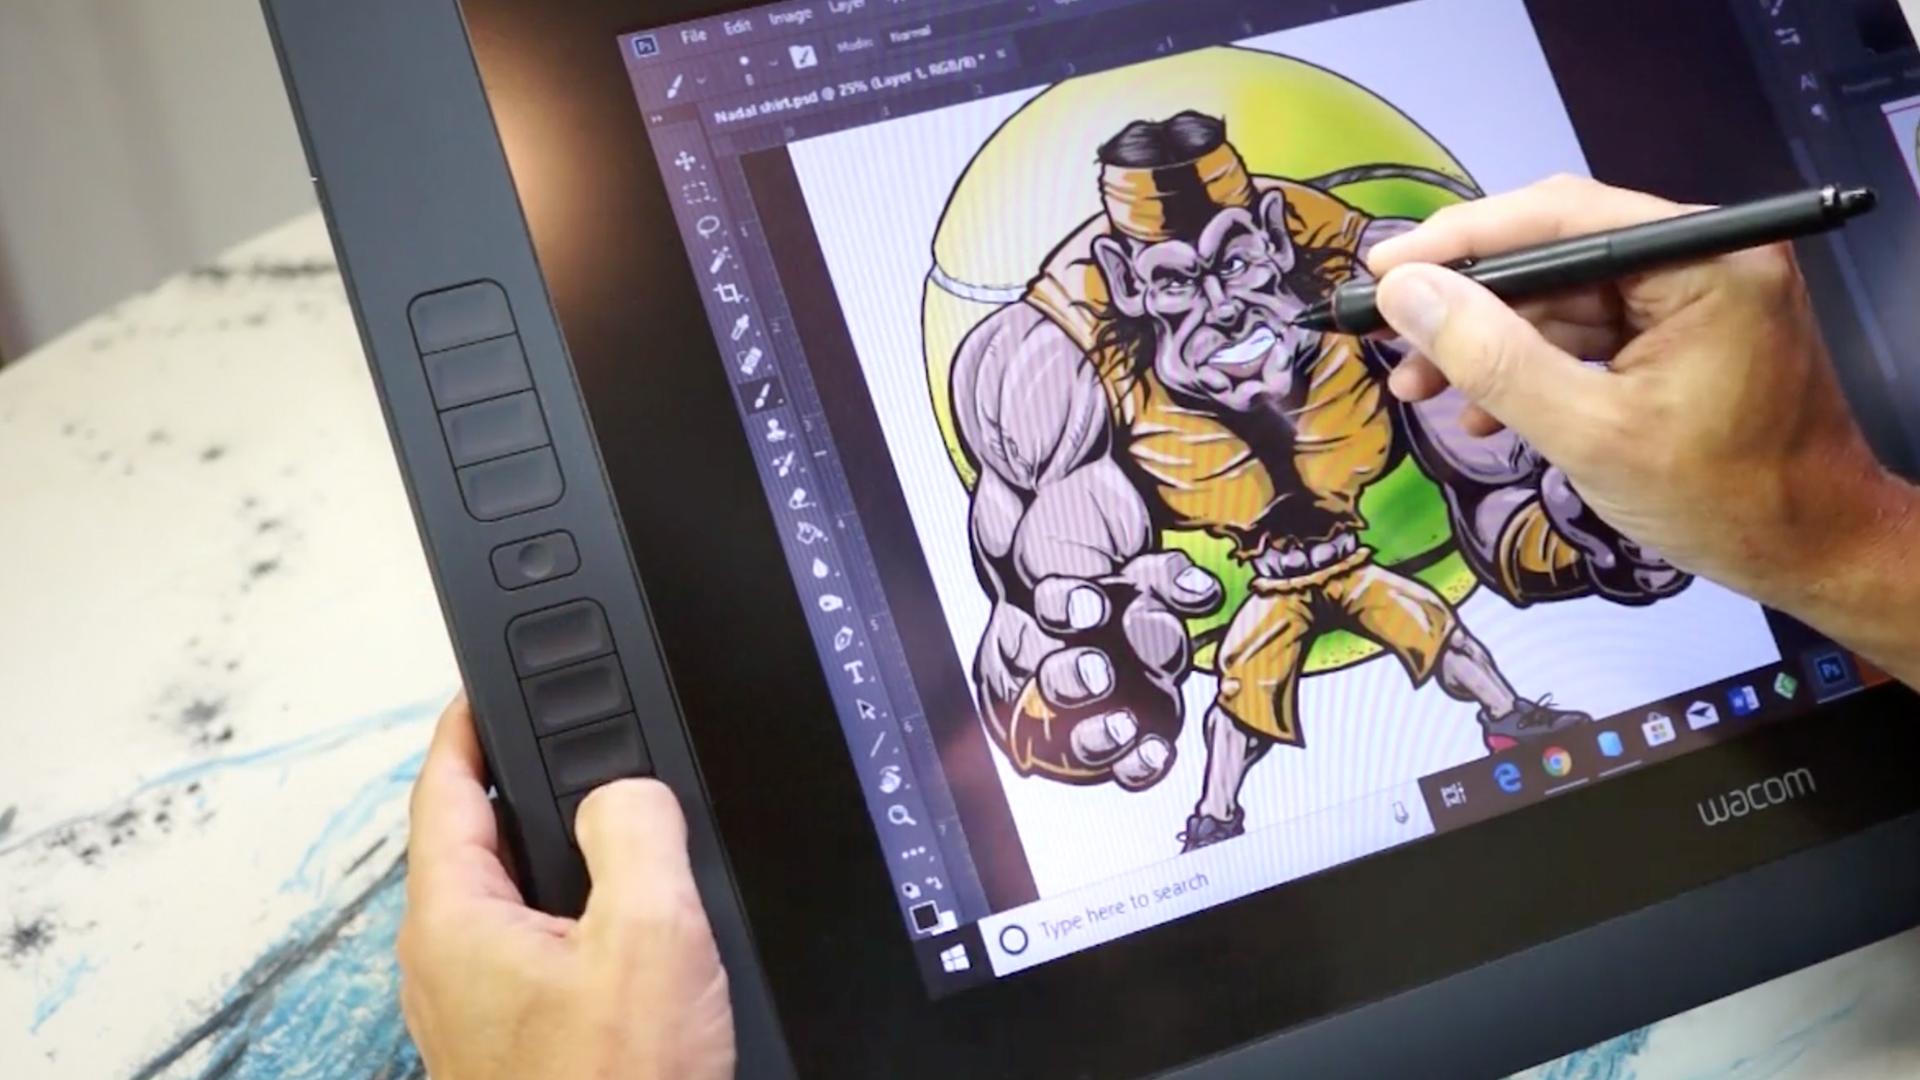 Wacom Tablet: Customizing ExpressKeys